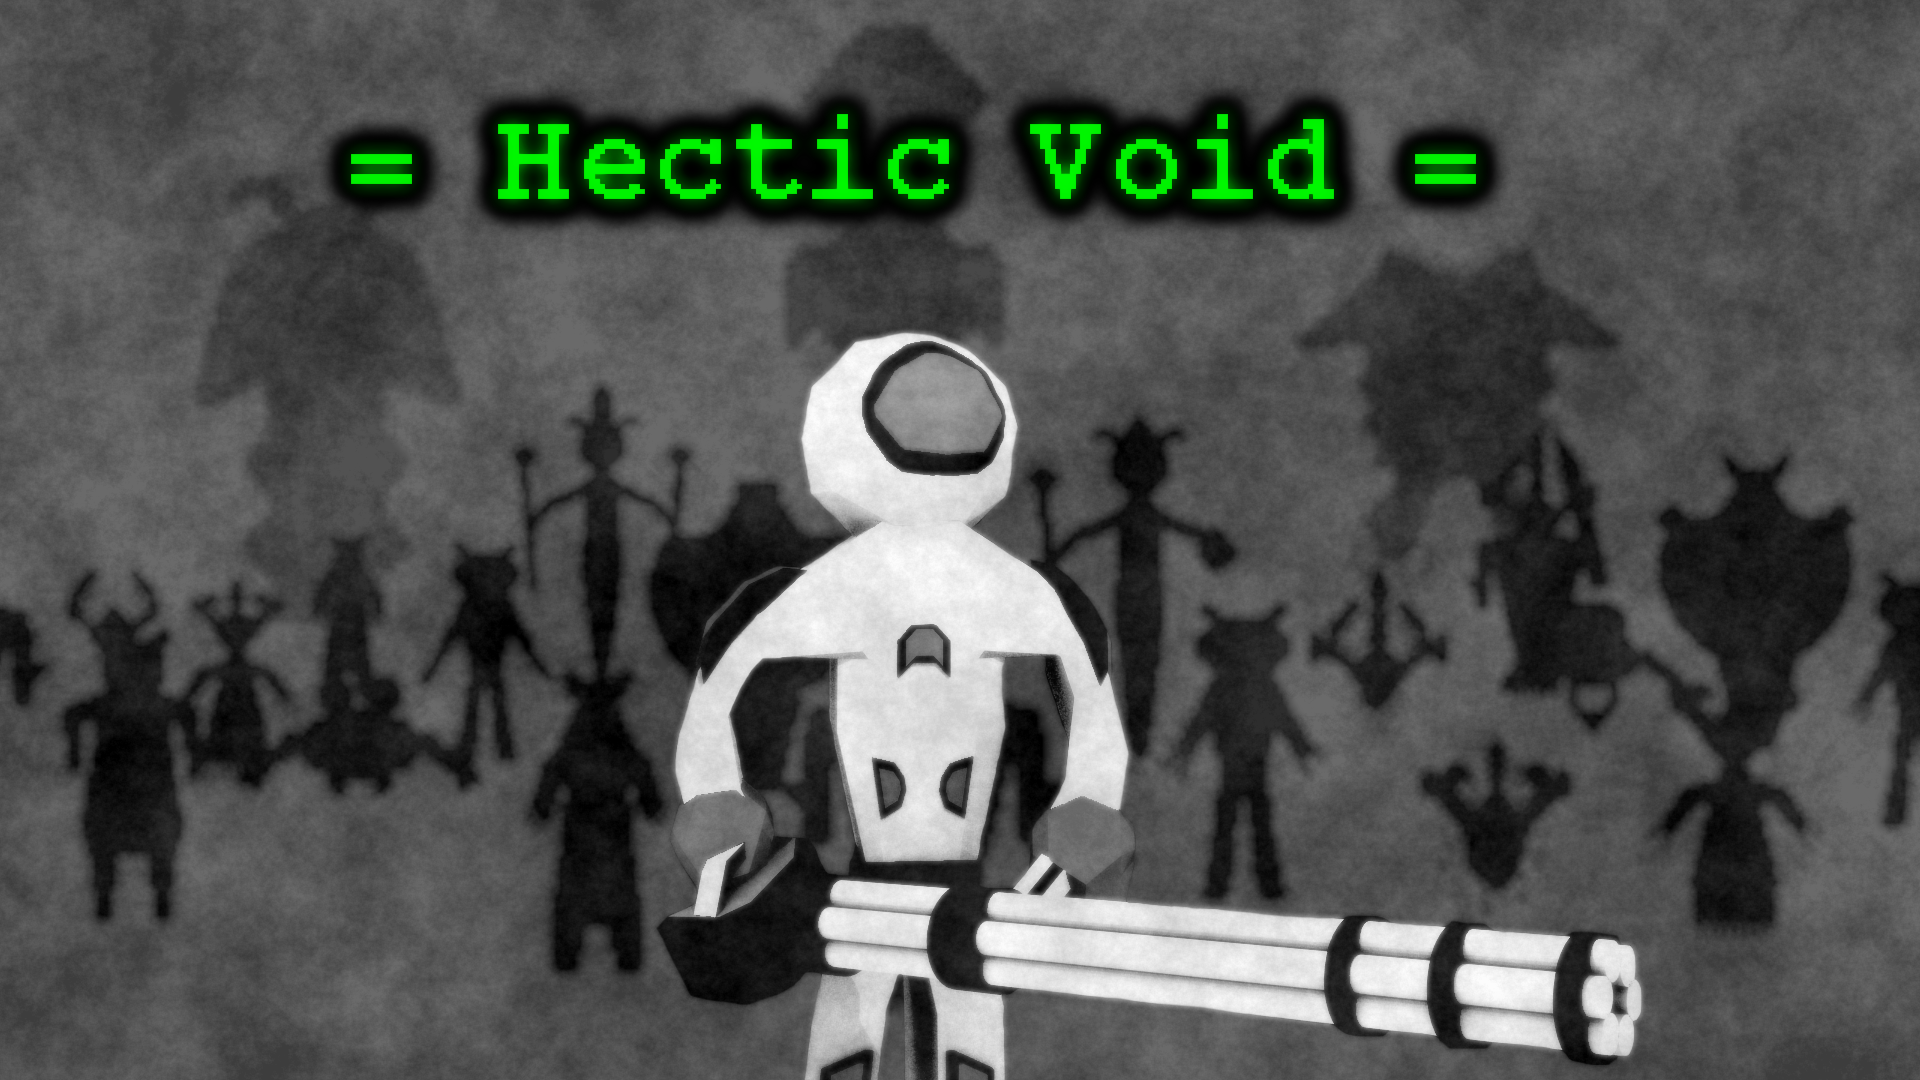 hecticvoid